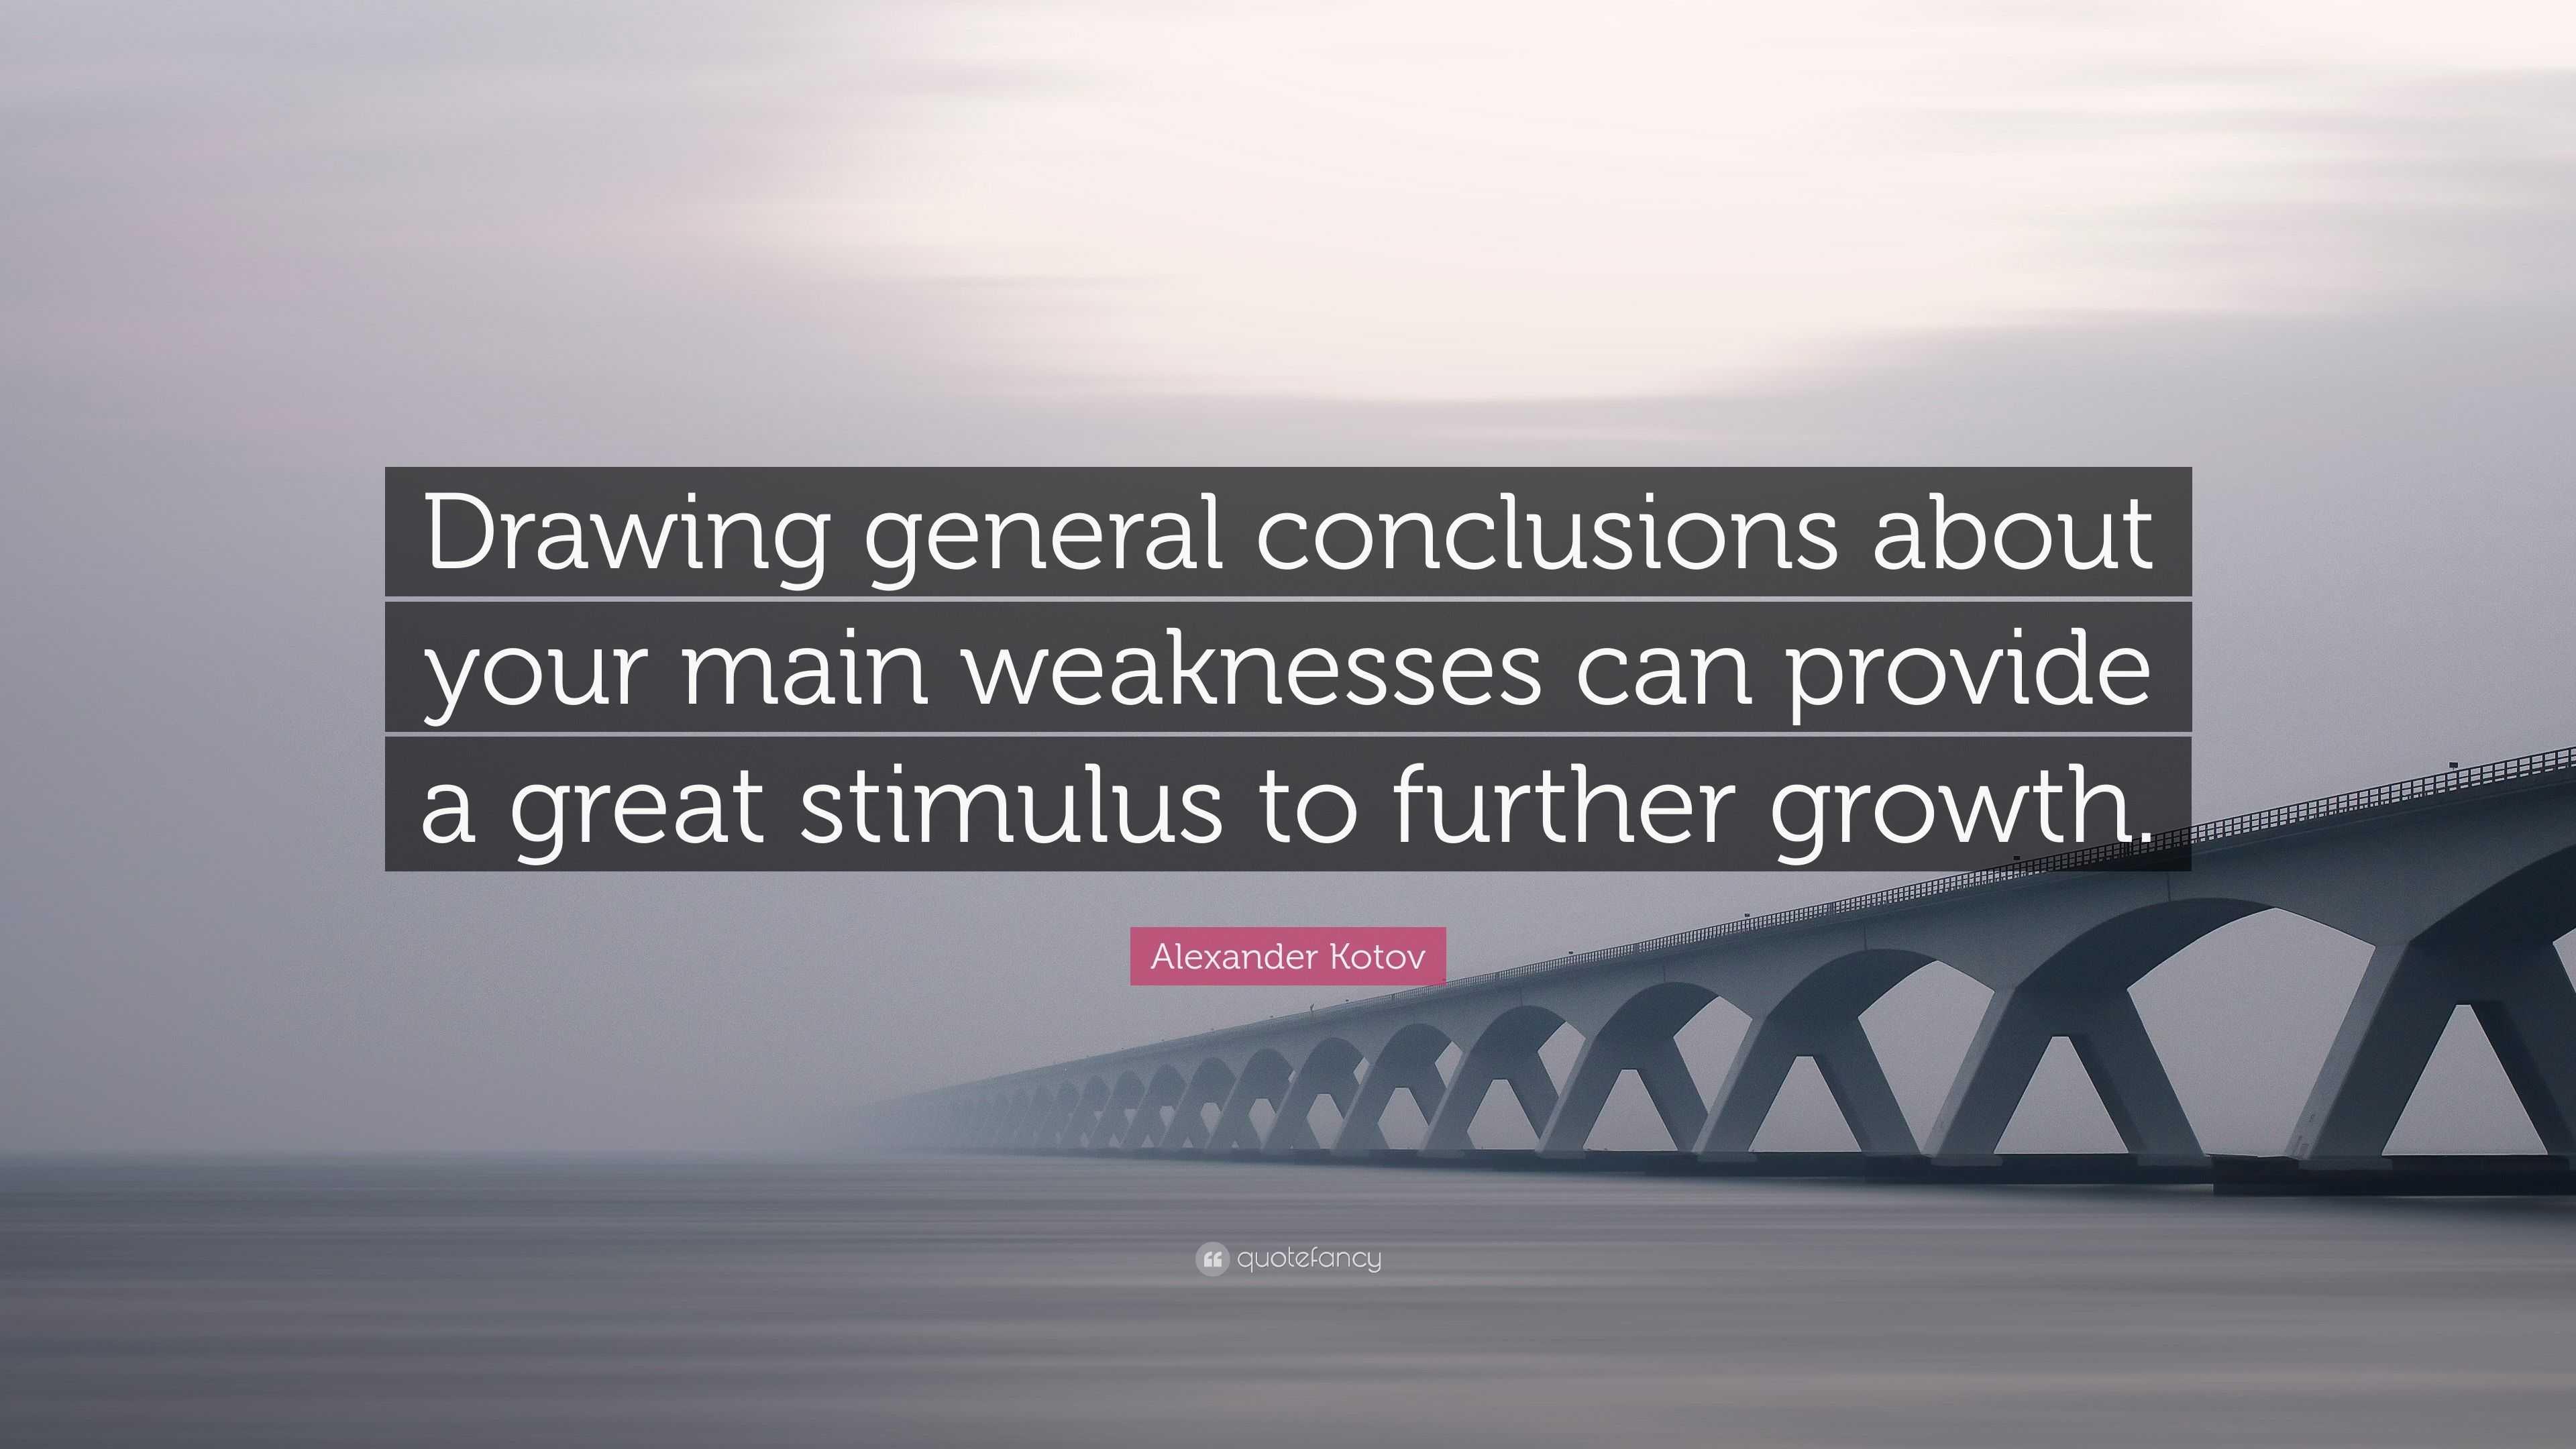 alexander the great weaknesses